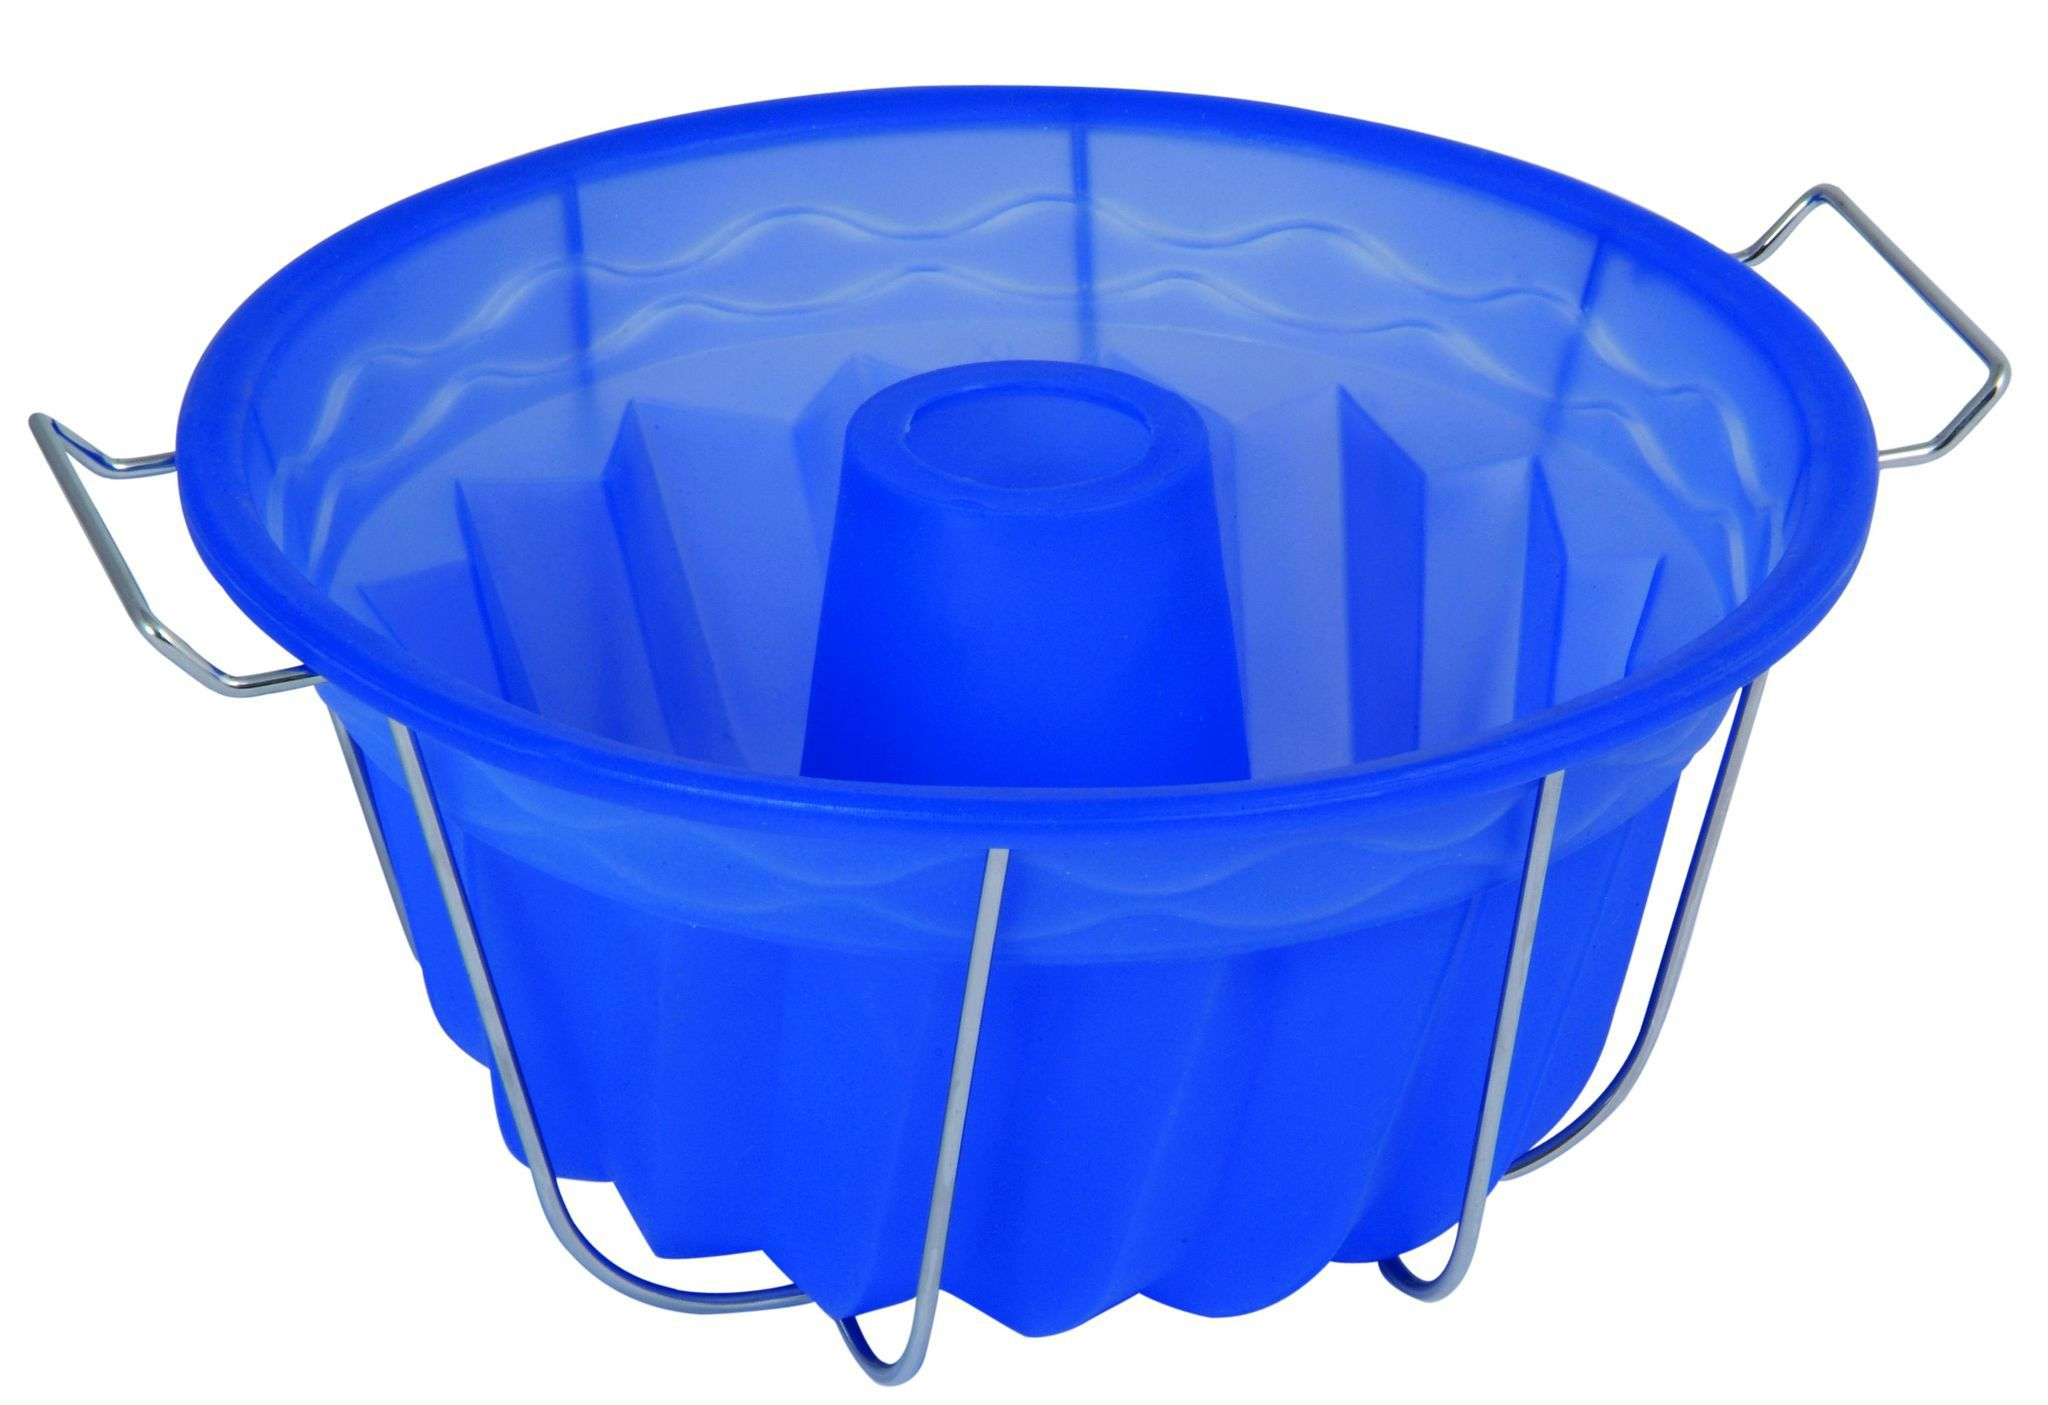 Форма Regent inoxВсе для выпечки<br>Тип: форма для выпечки,<br>Материал: силикон,<br>Размер противня: 230x100мм<br>